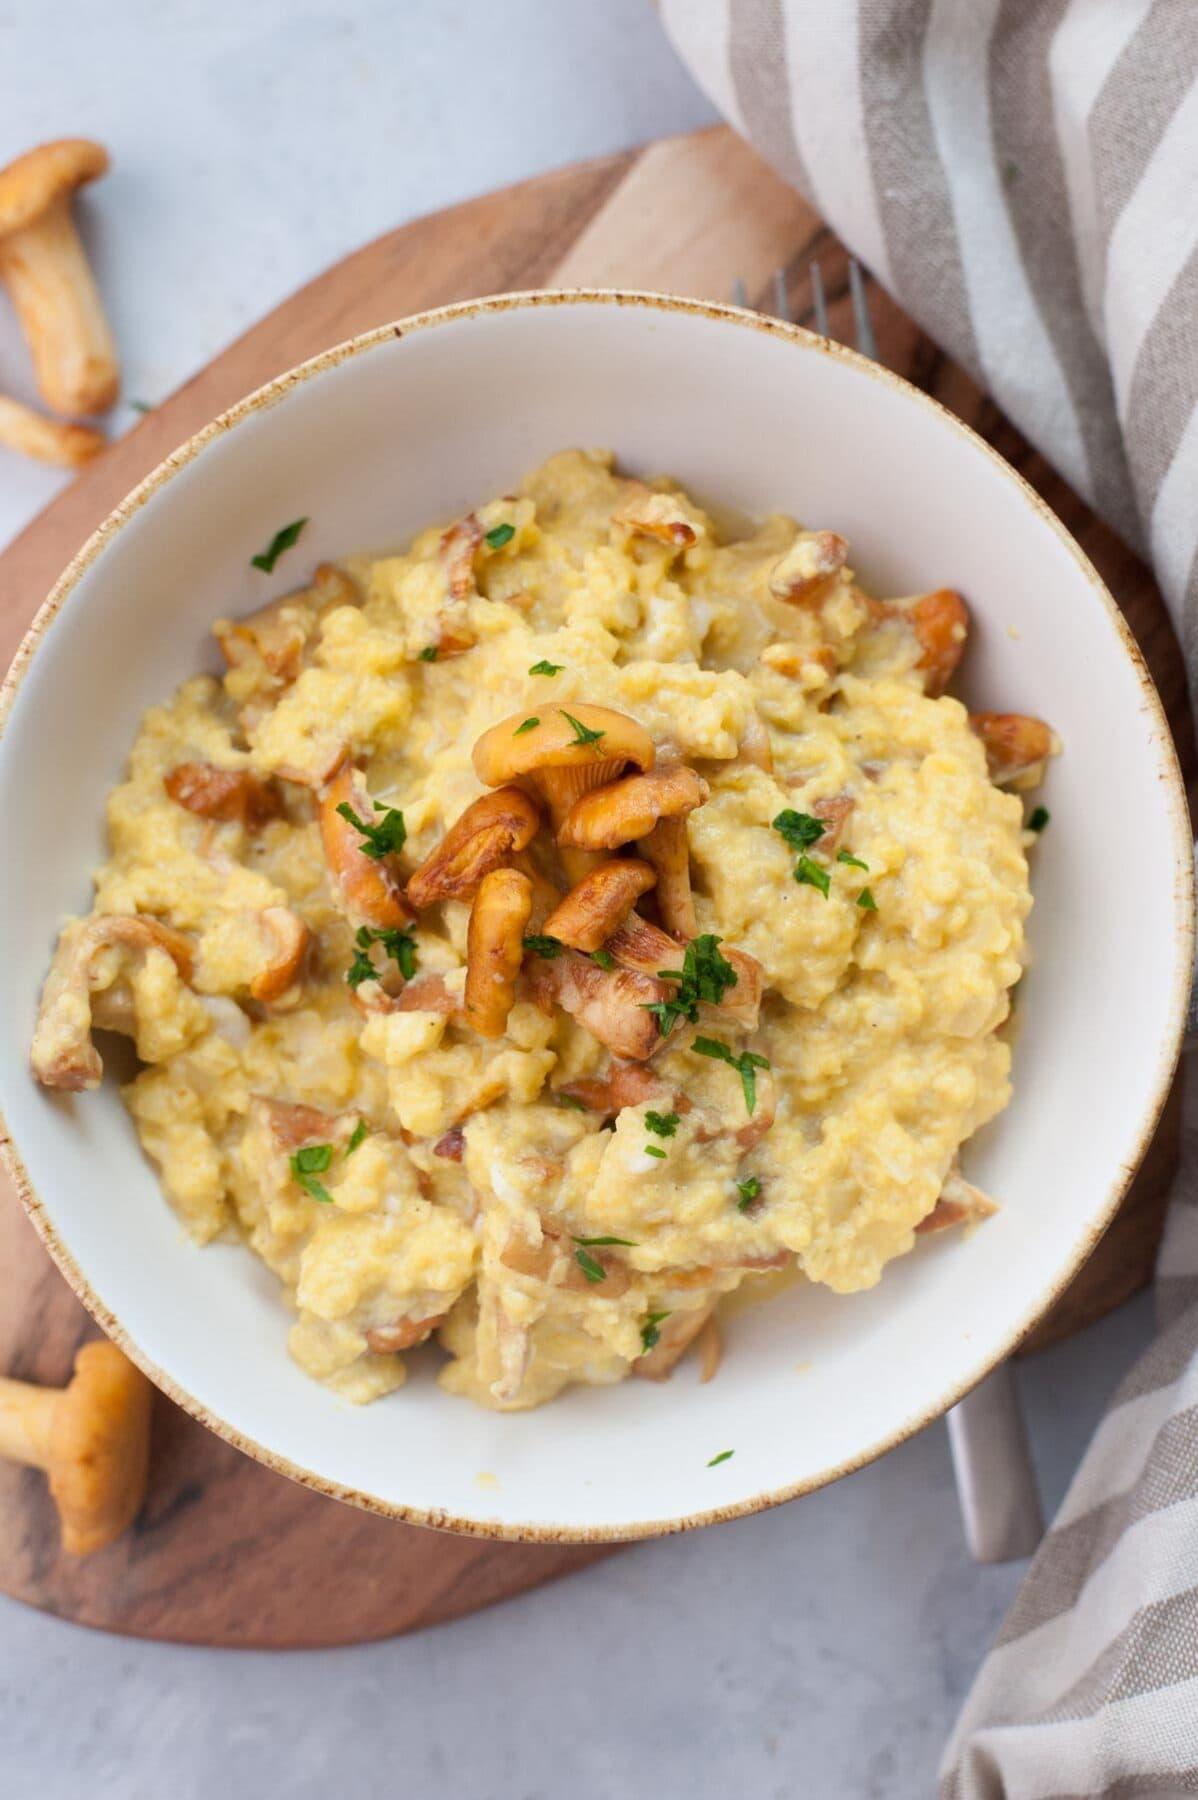 Chanterelle scrambled eggs in a white bowl.